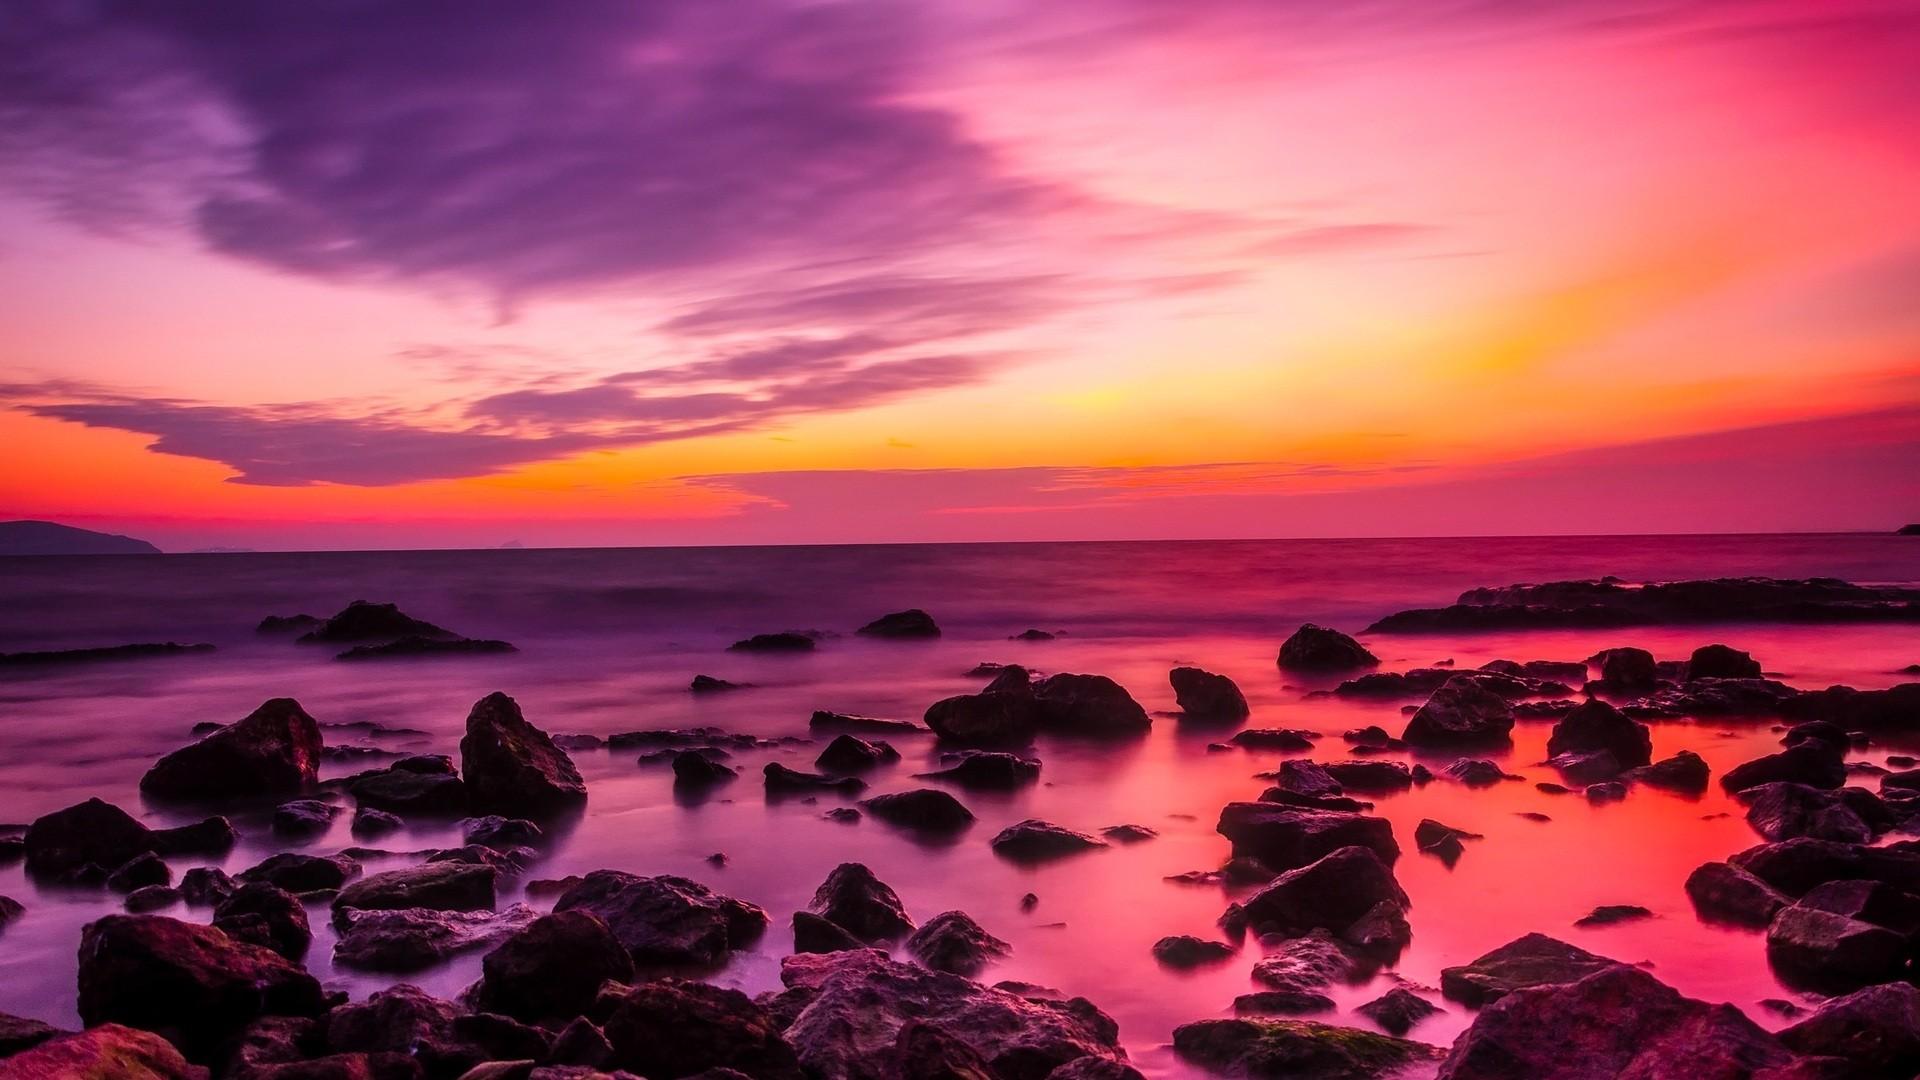 Pink Sunset Download Wallpaper